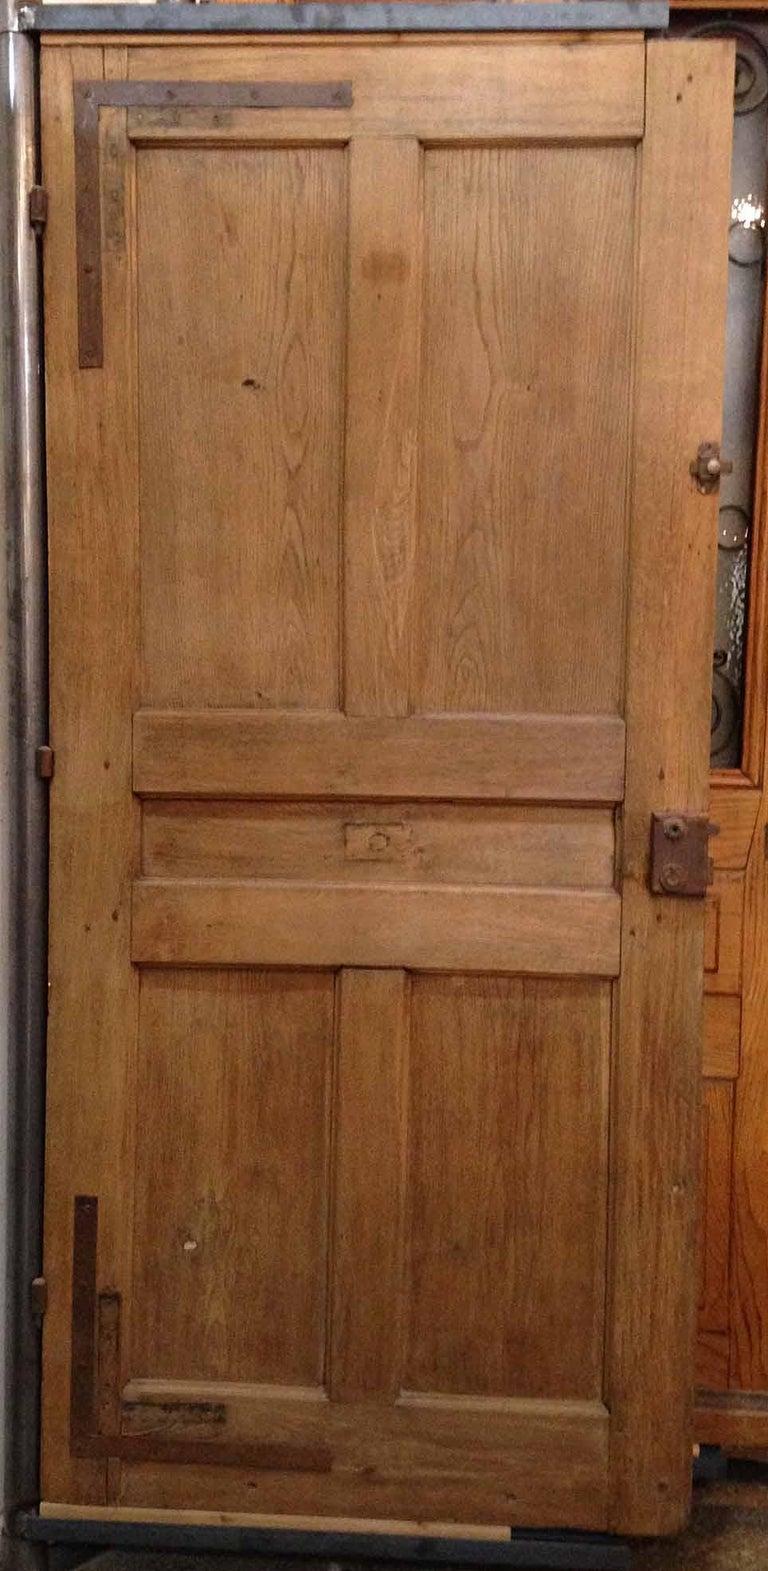 Antique French single door  Origin: France  circa 1860  Measurements: 39